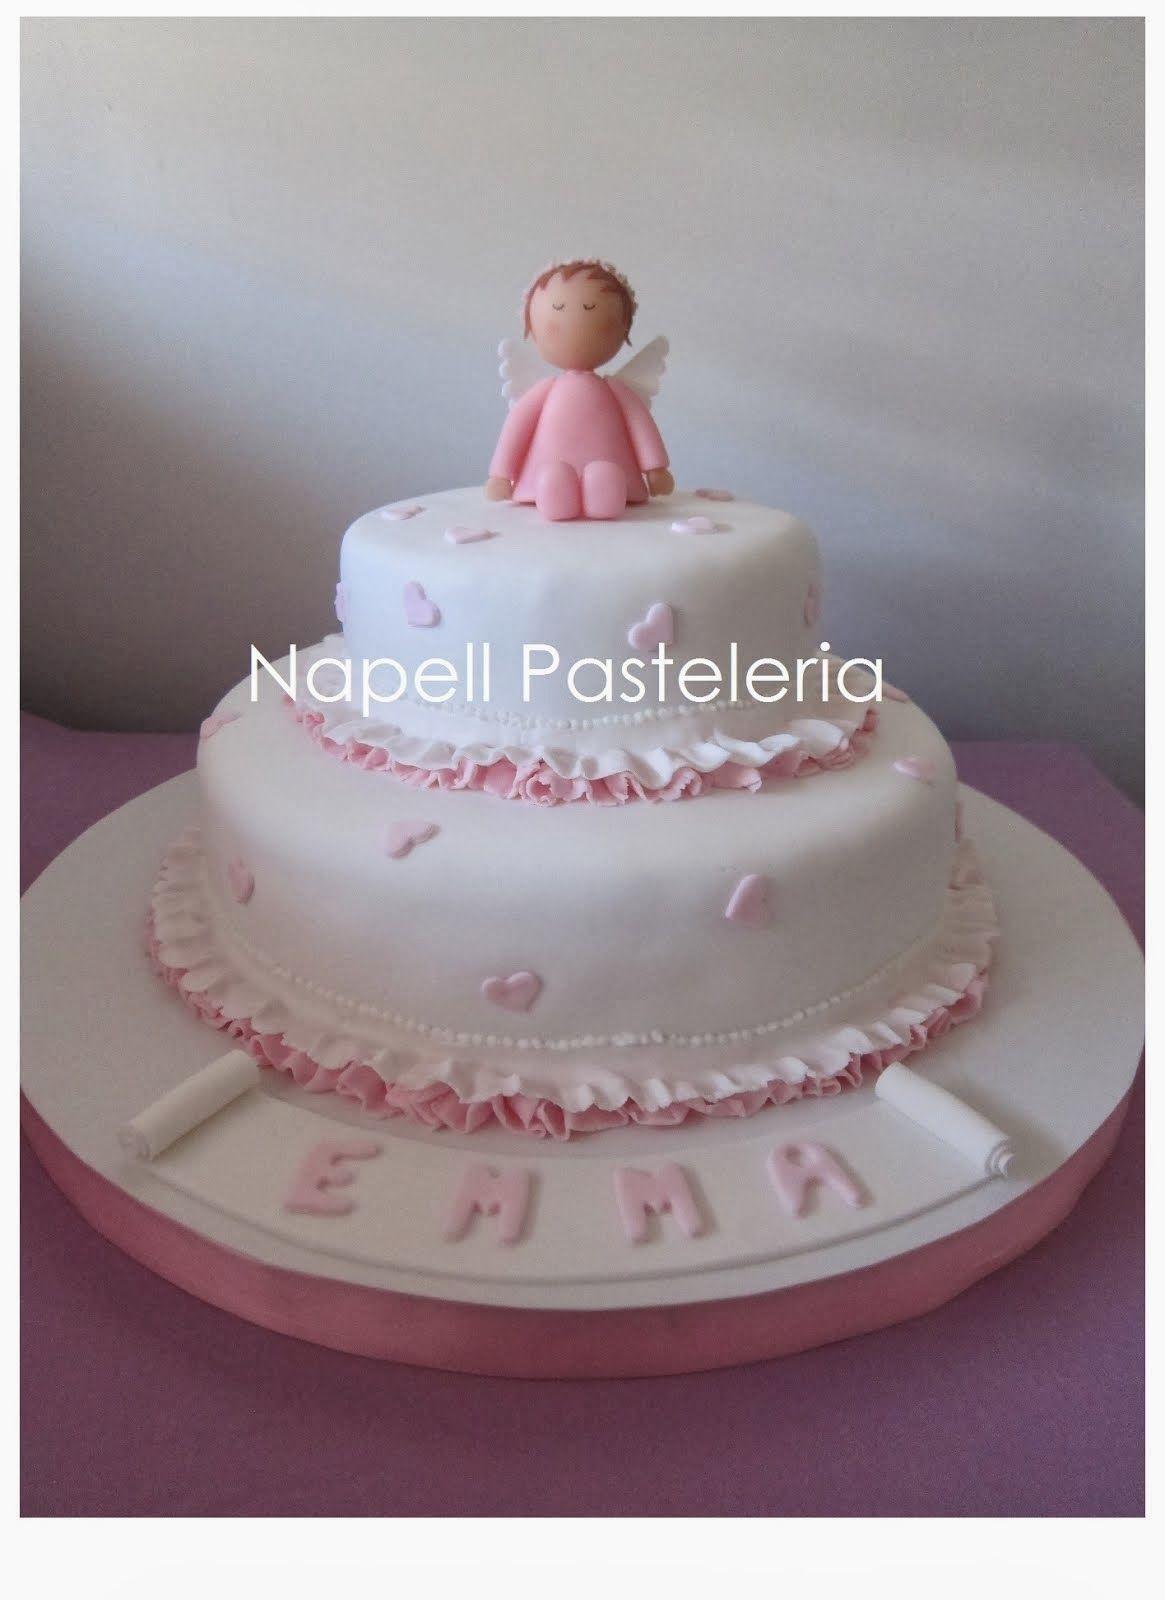 Cake Decorating Supplies In Stockton